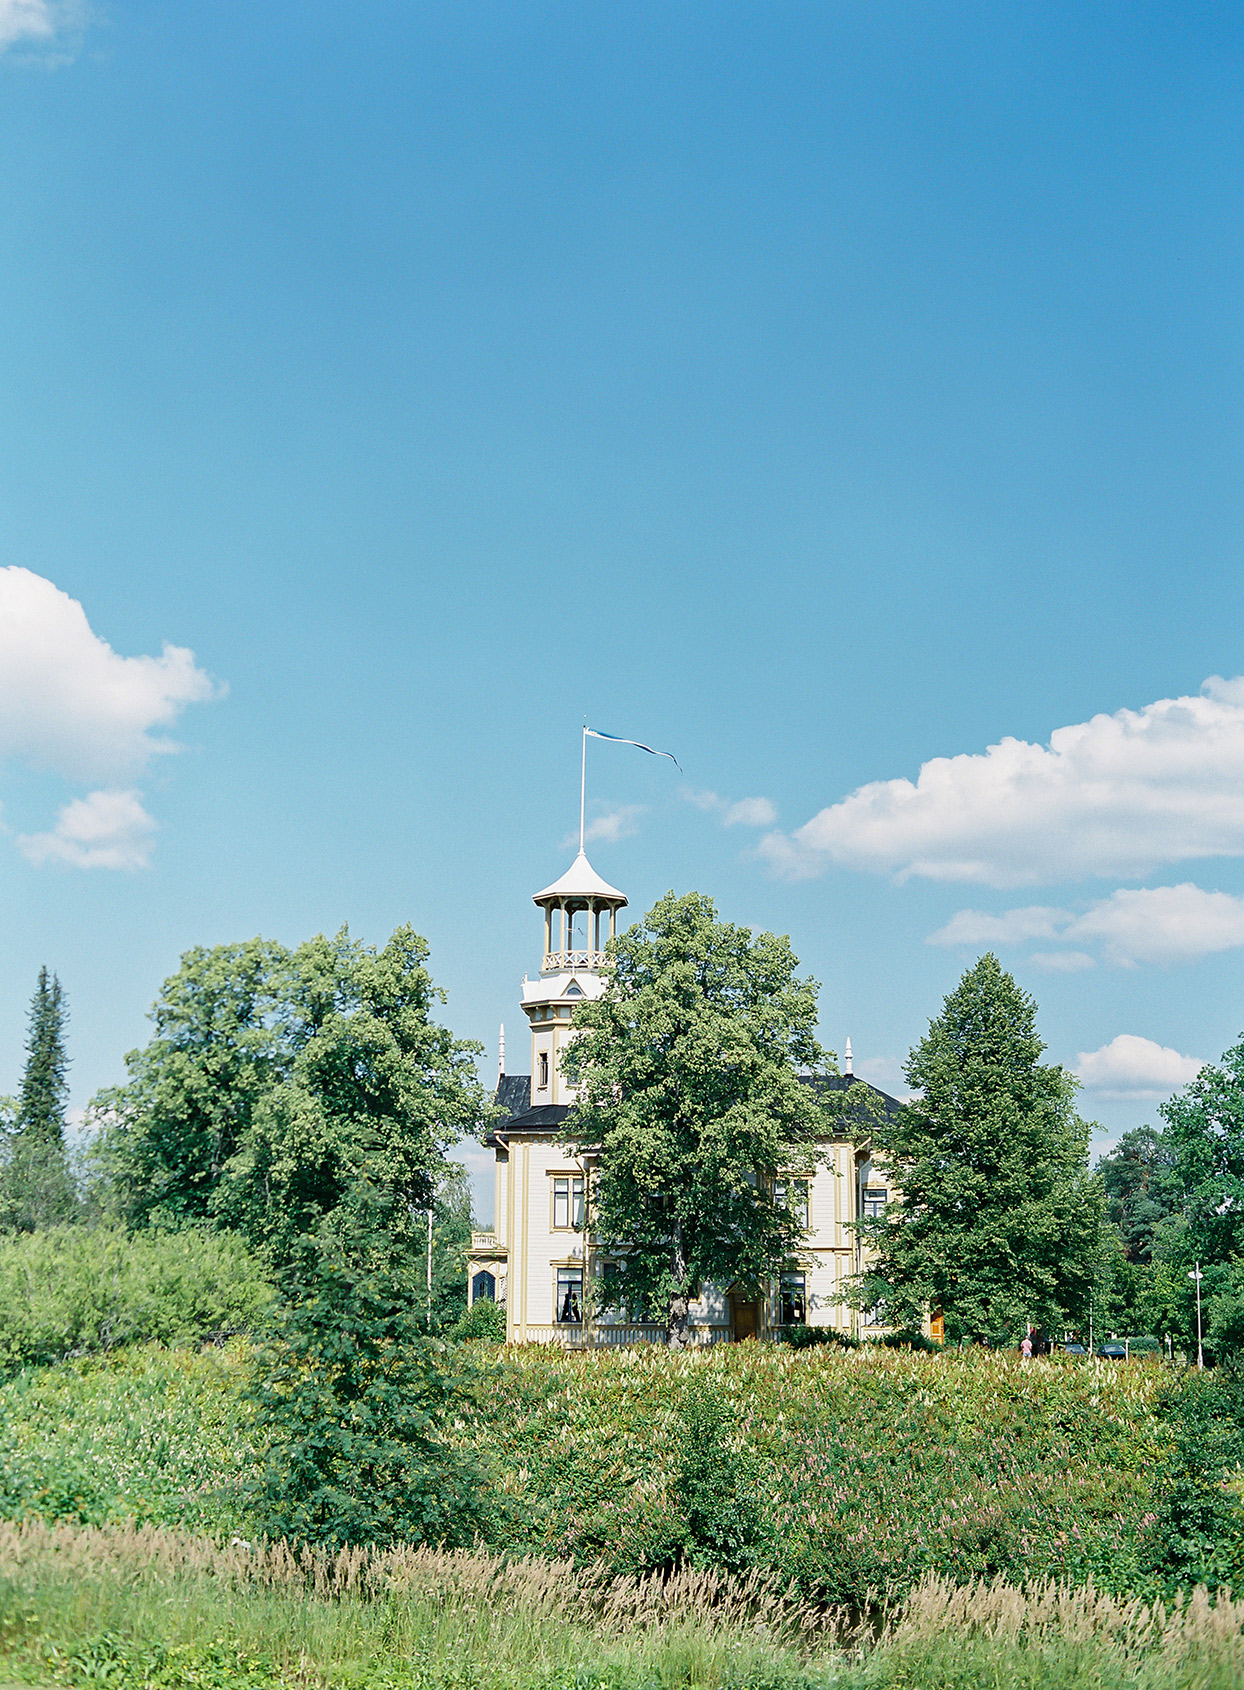 laura alexander wedding venue in the country